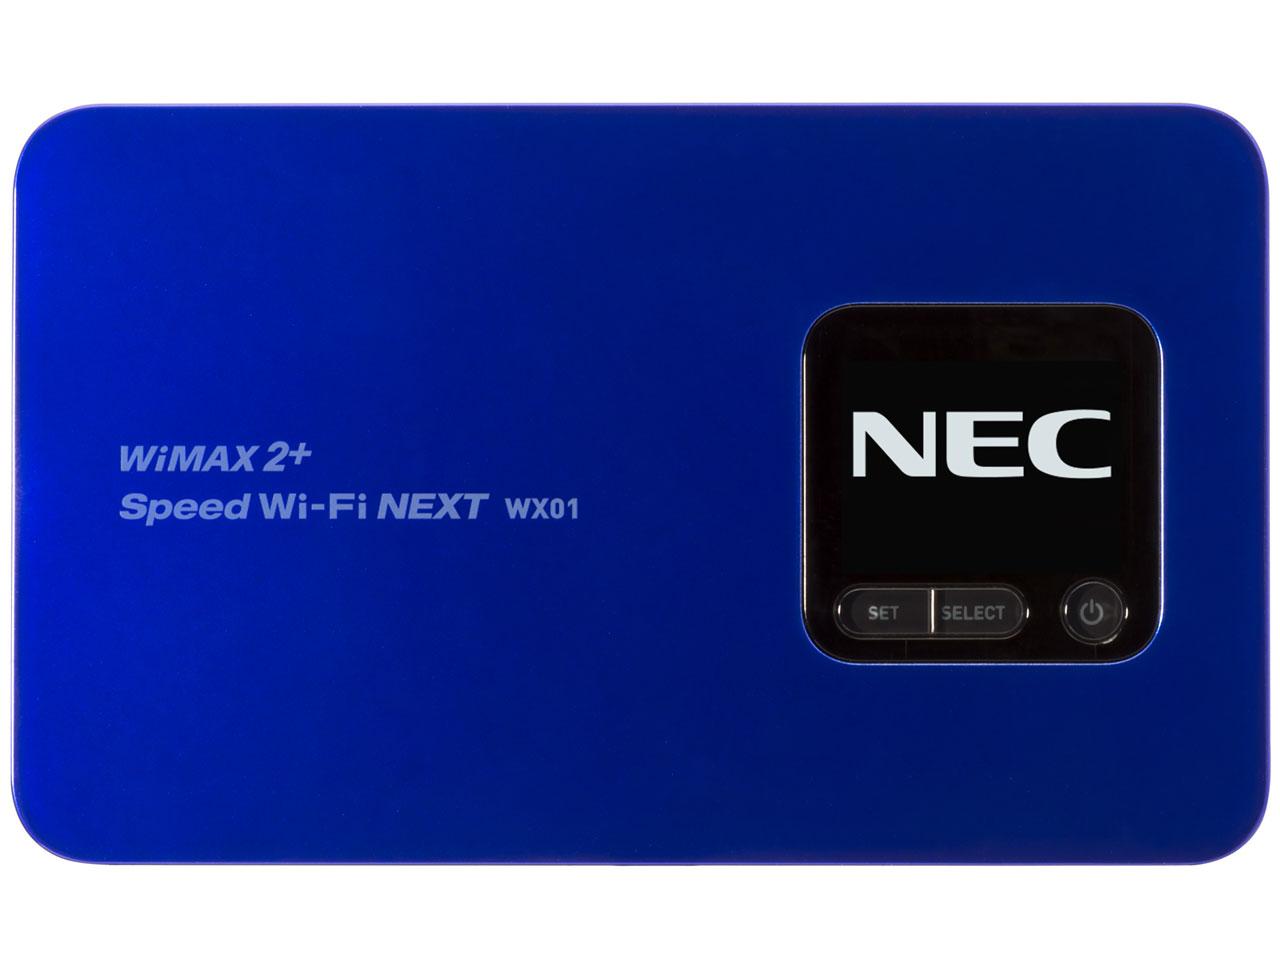 Speed Wi-Fi NEXT WX01 [ディープブルー] の製品画像